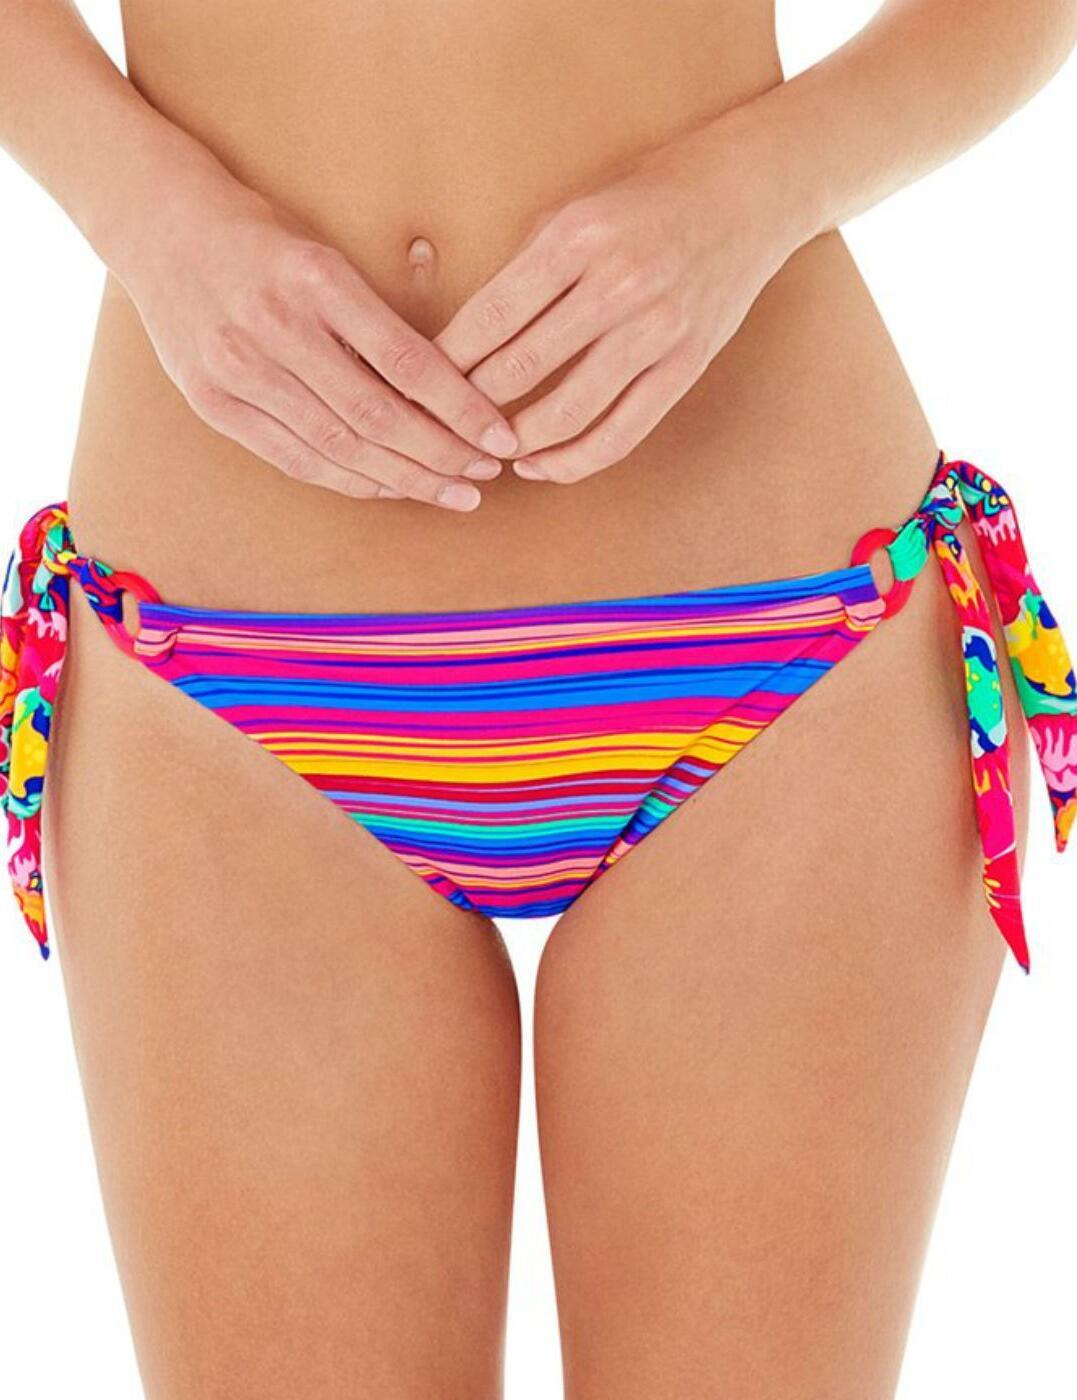 1571720 Lepel Sun Kiss Tie Side Bikini Pant Pink Multi - 1571720 Tie Bikini Brief